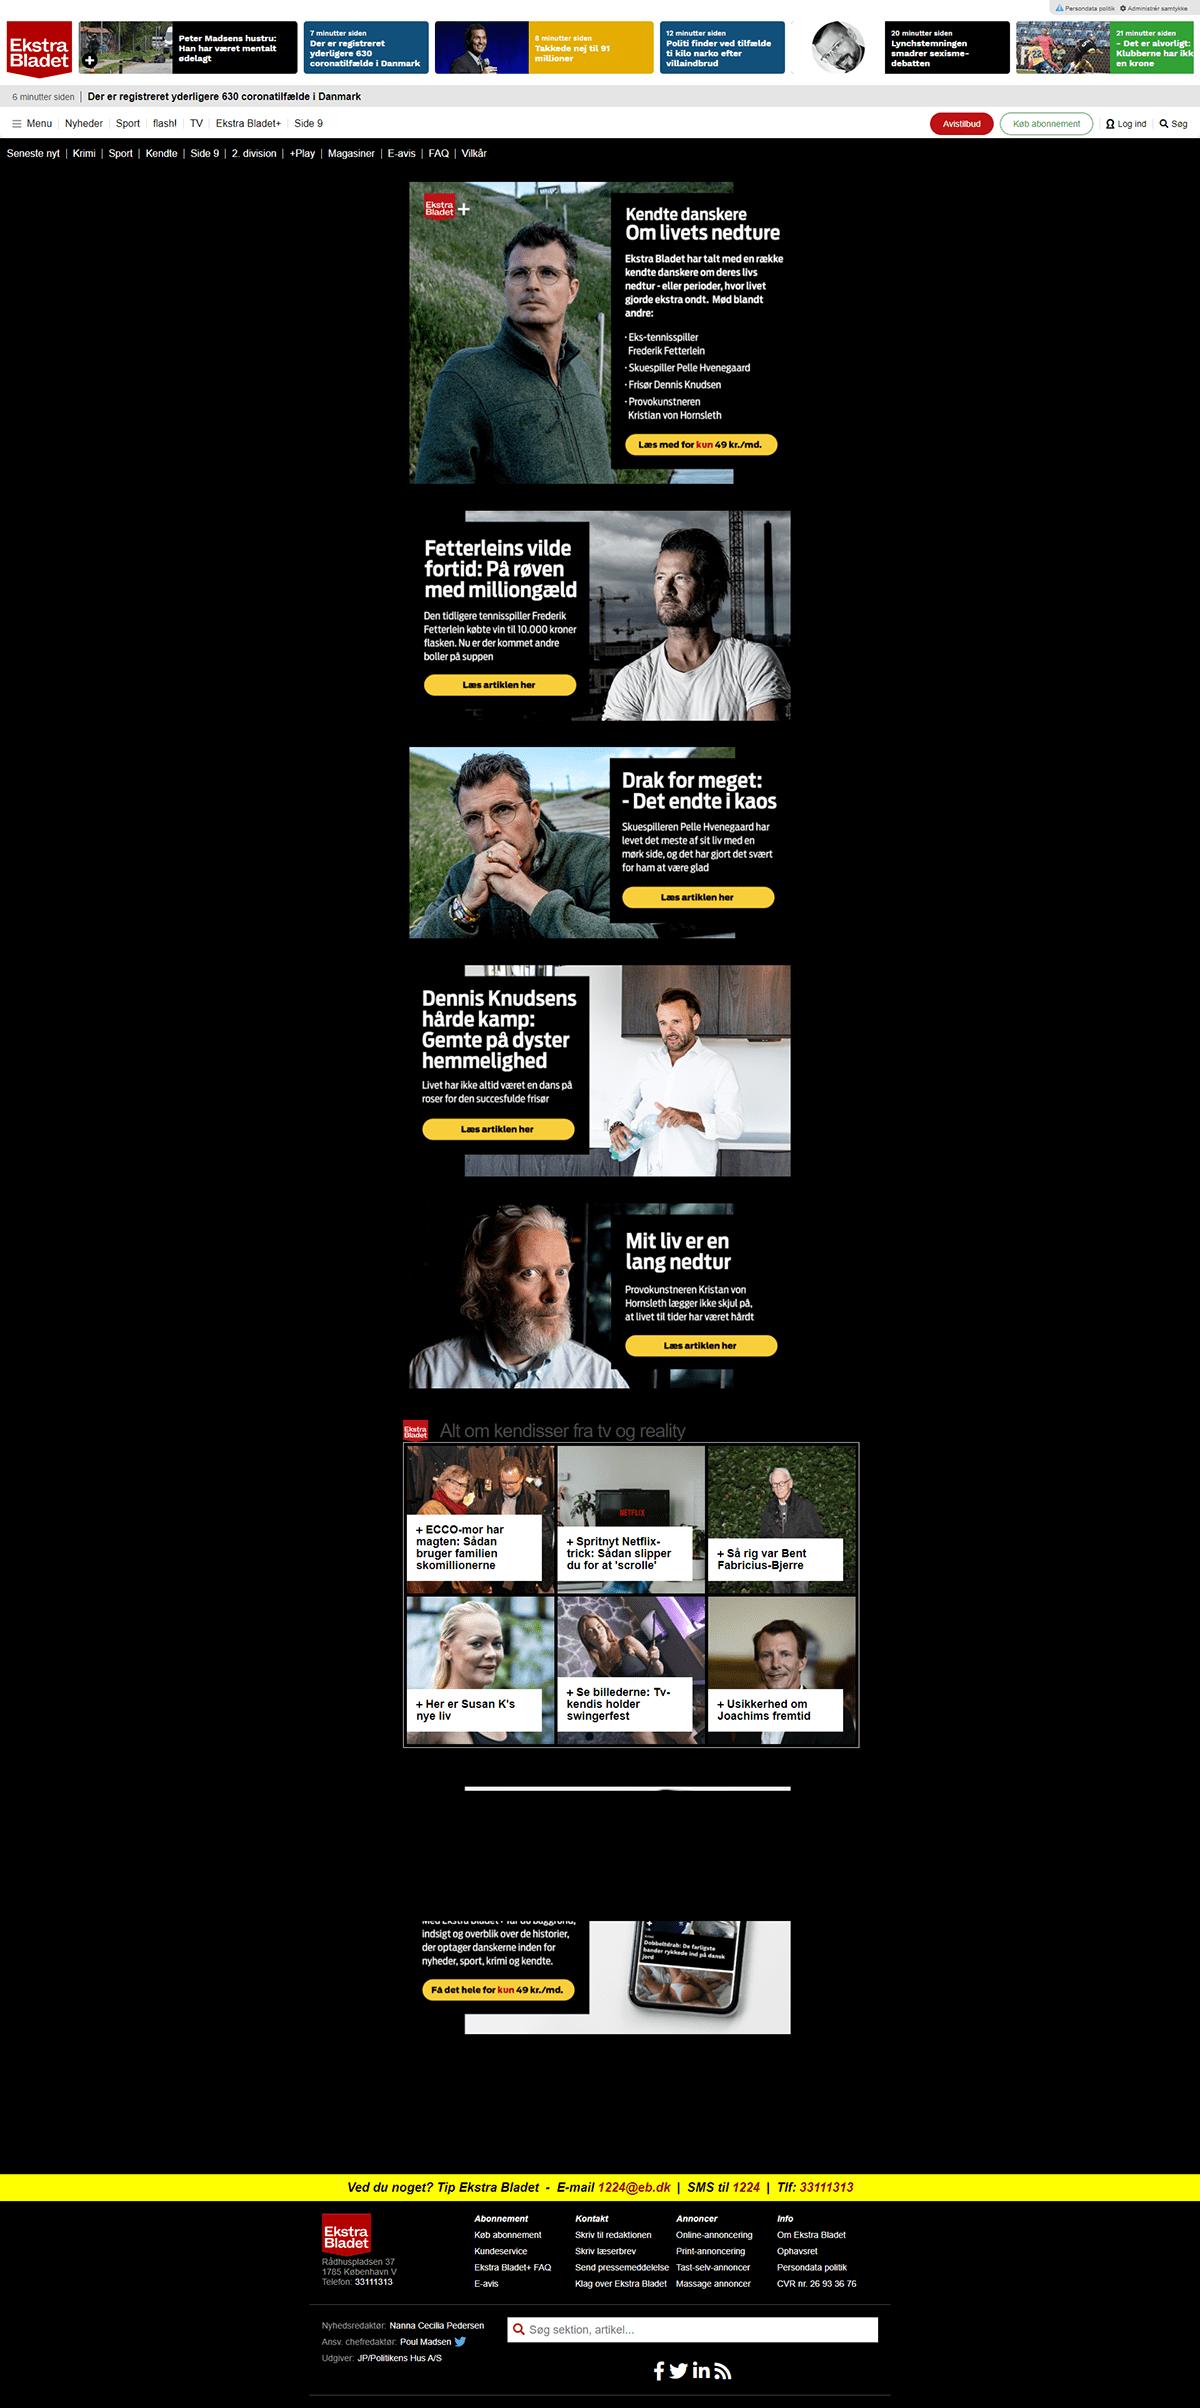 branding  branding campaign Content Management System editioral escenic Escenic Content Studio parallax UX design